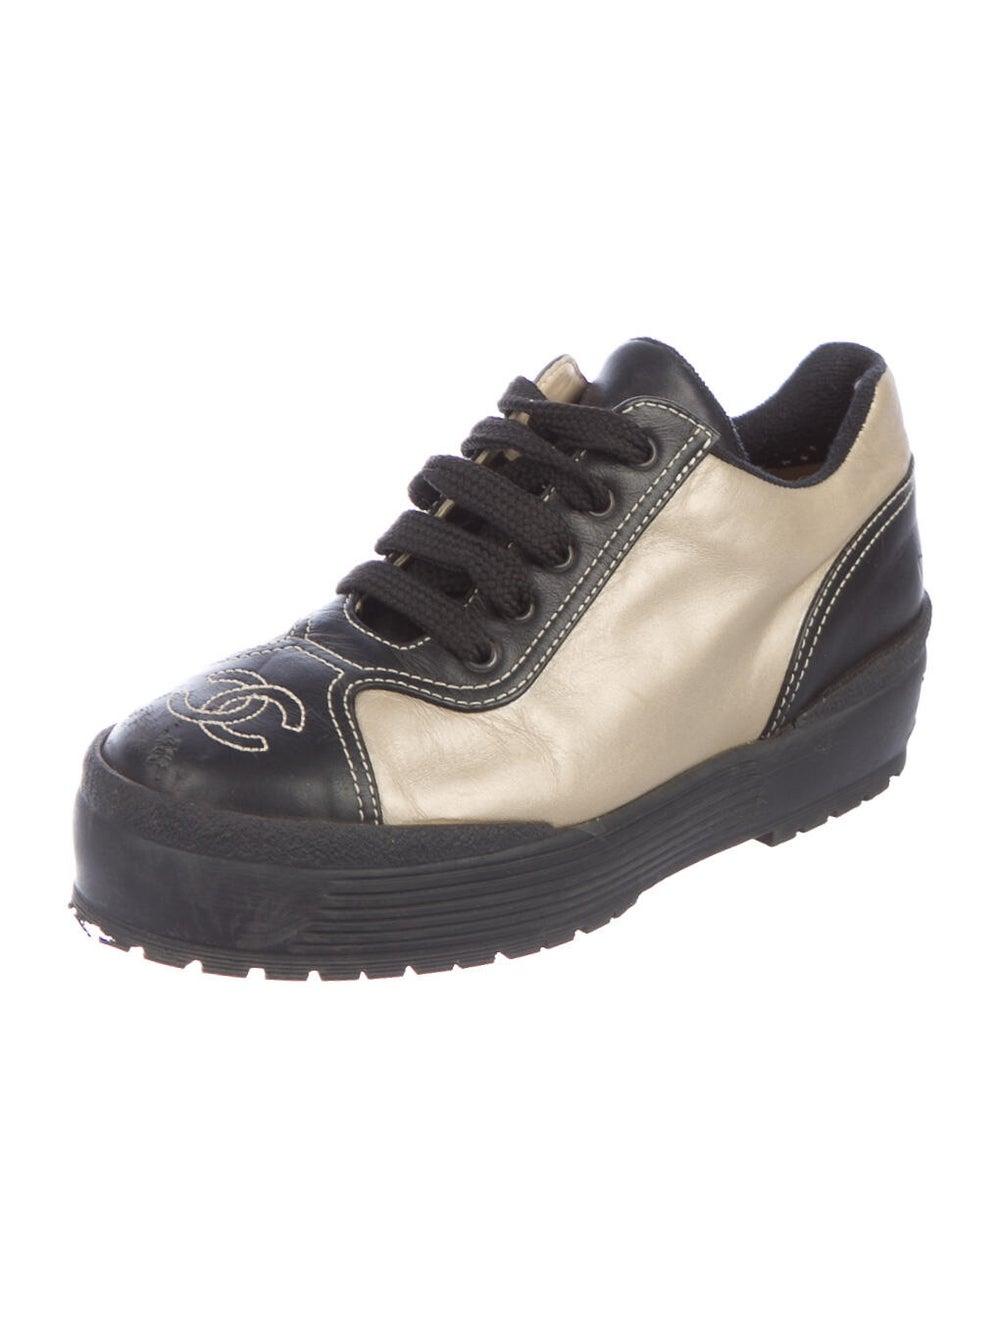 Chanel Interlocking CC Logo Leather Sneakers - image 2